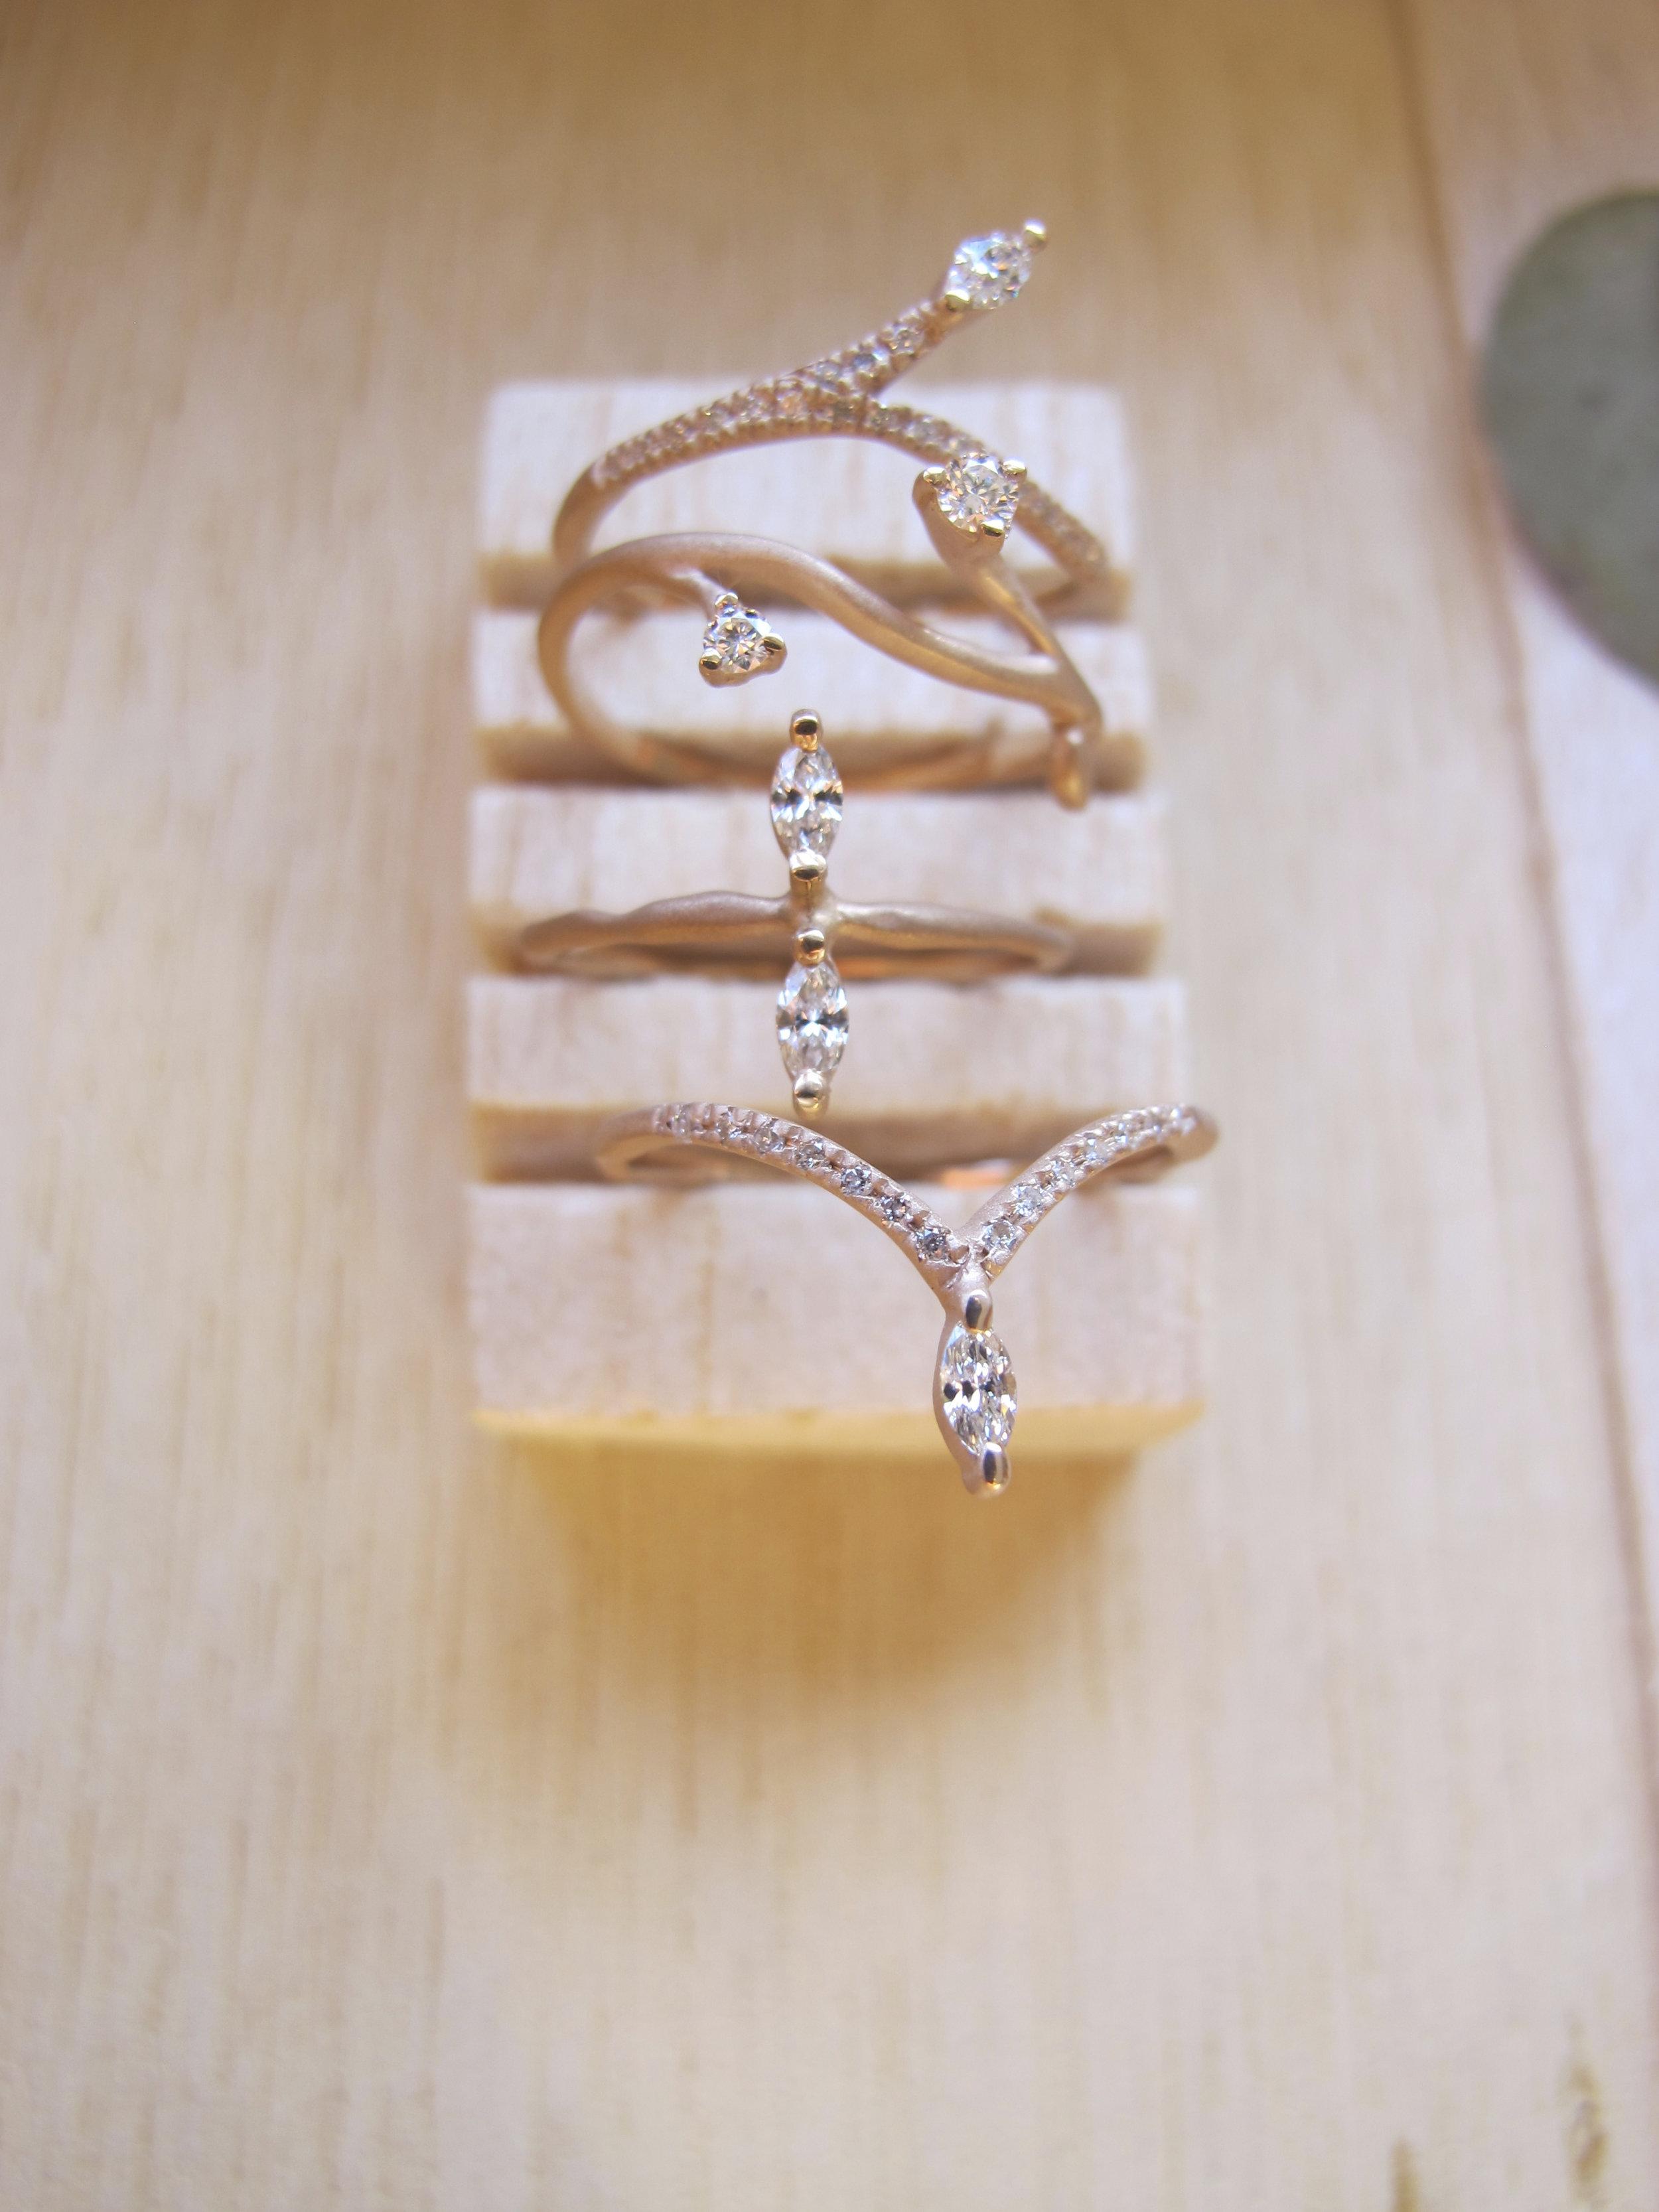 anéis sementes ouro e diamantes fabimalavazi .jpg